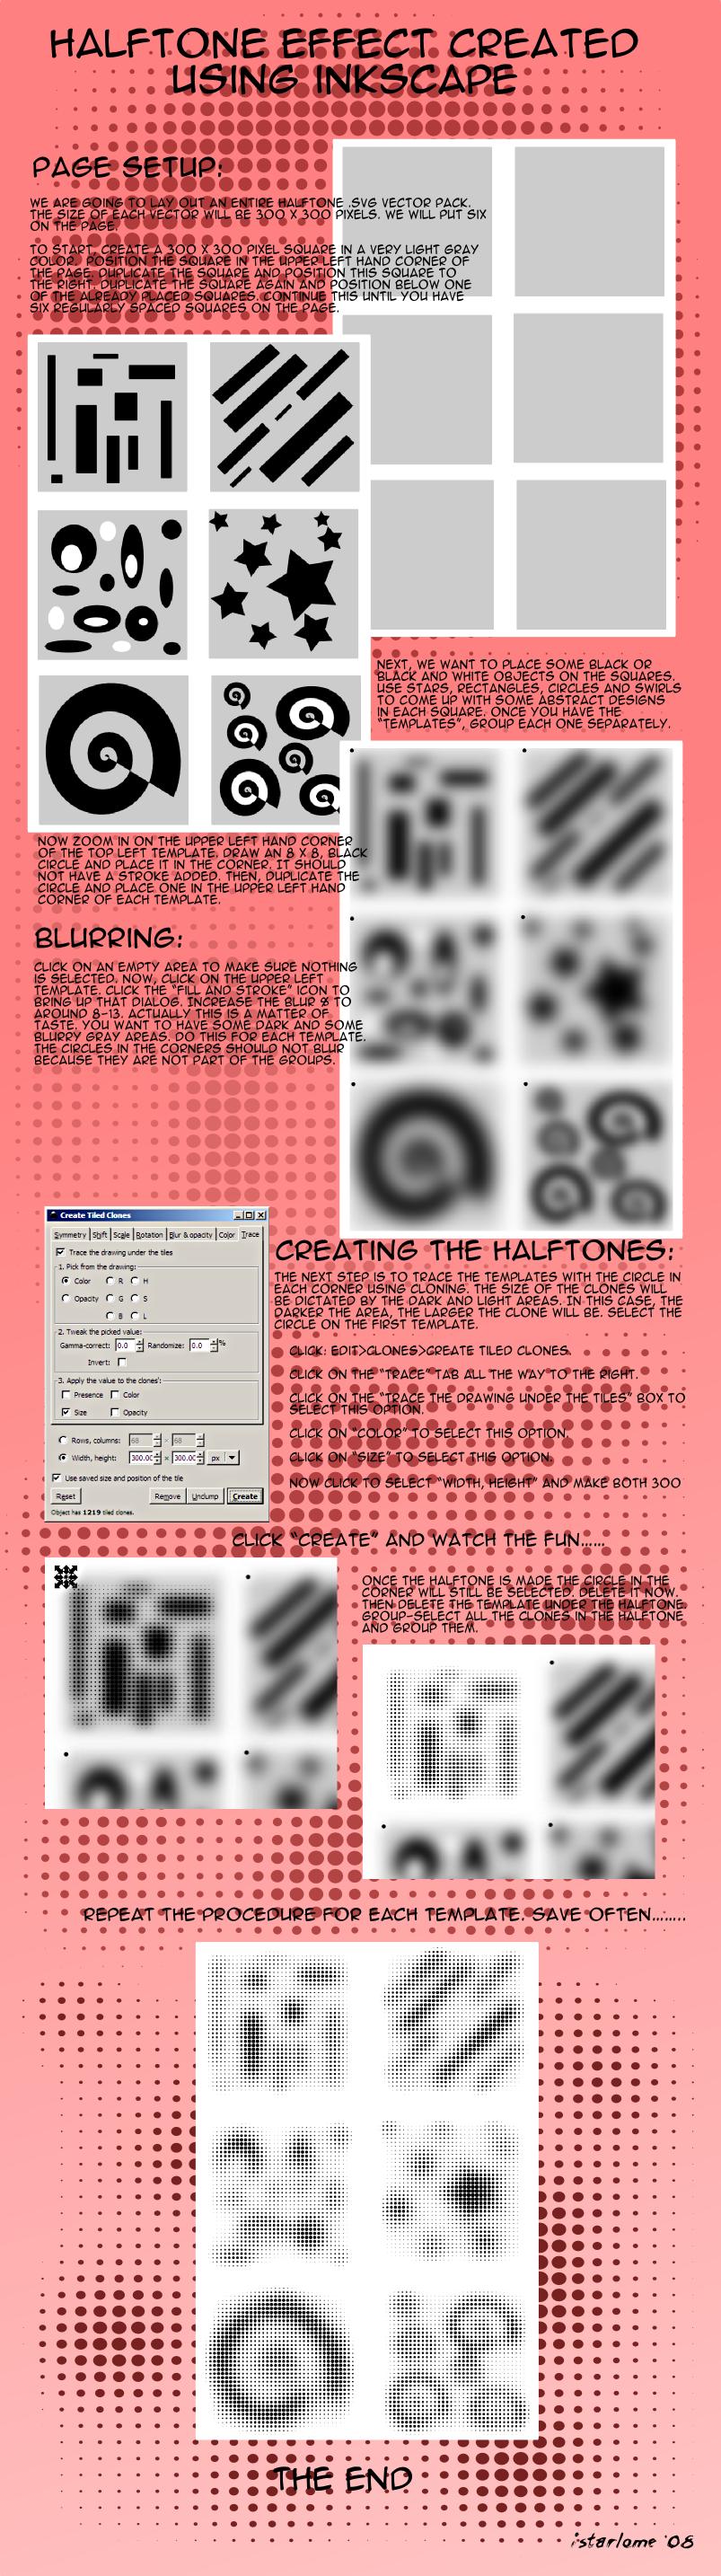 halftone effect in inkscape